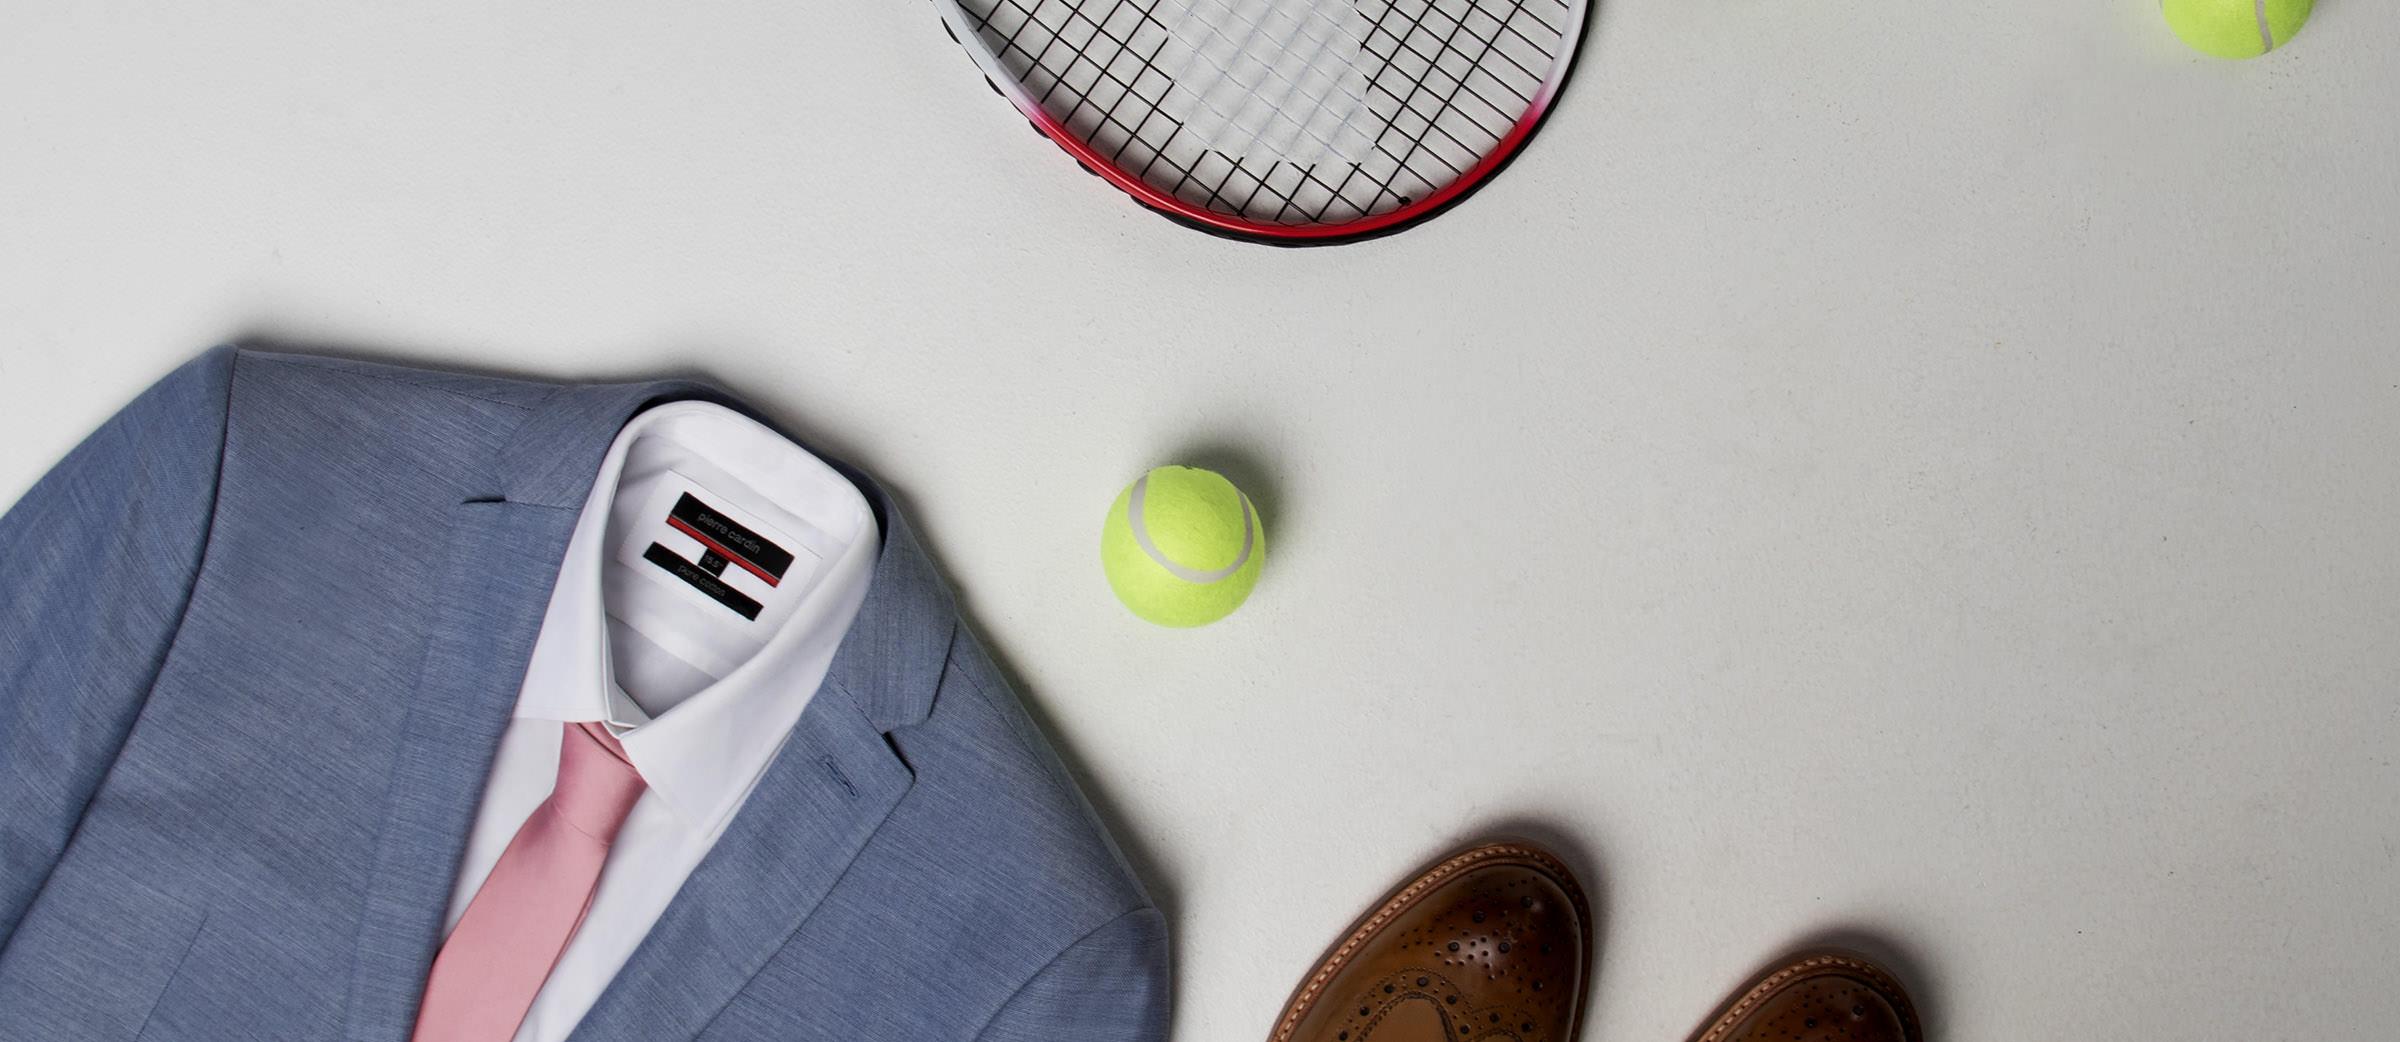 Wimbledon Inspiration: Best Dressed Stars at the Tournament